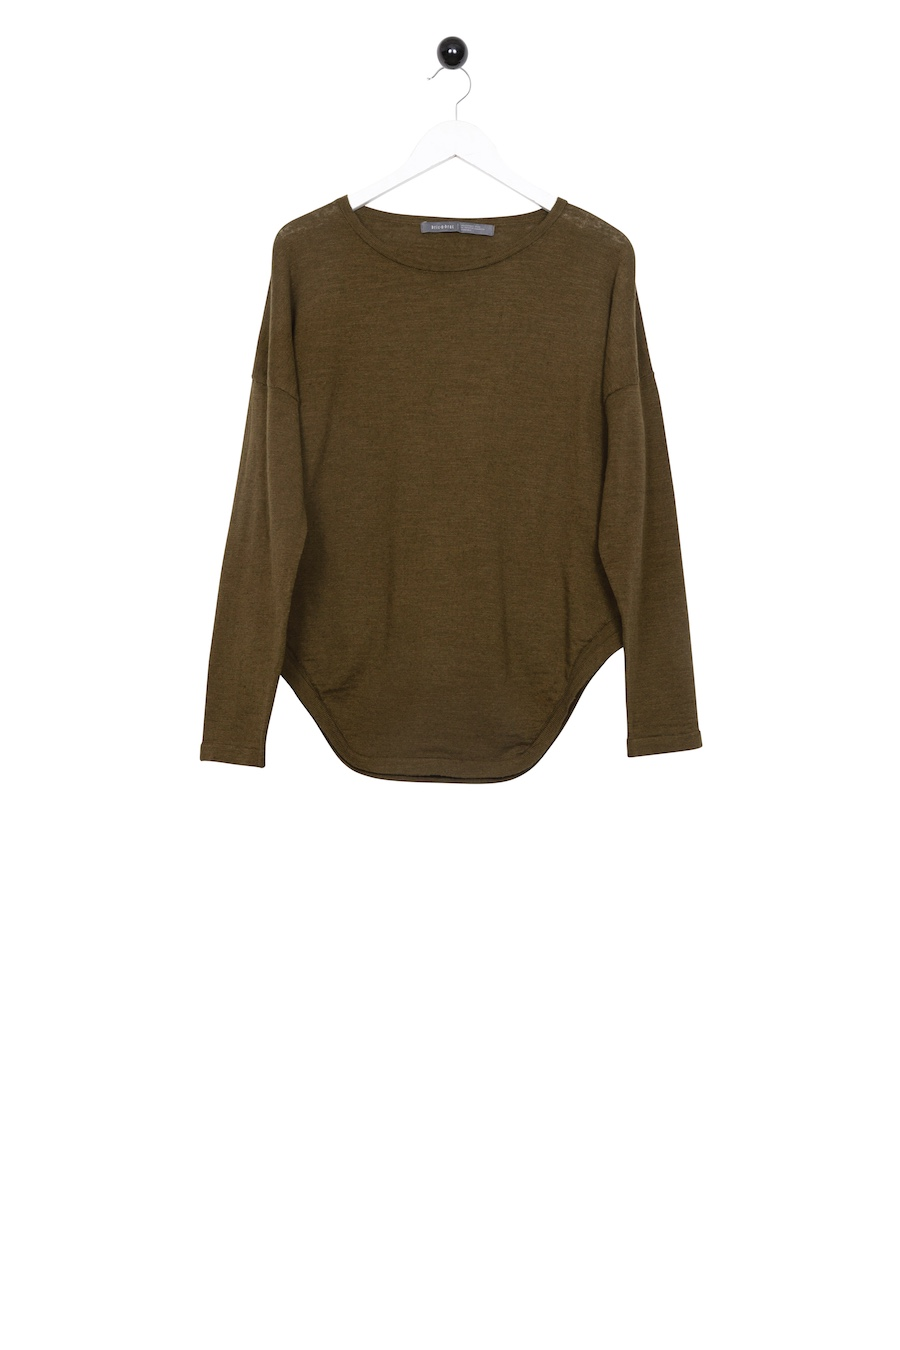 Kisel Sweater